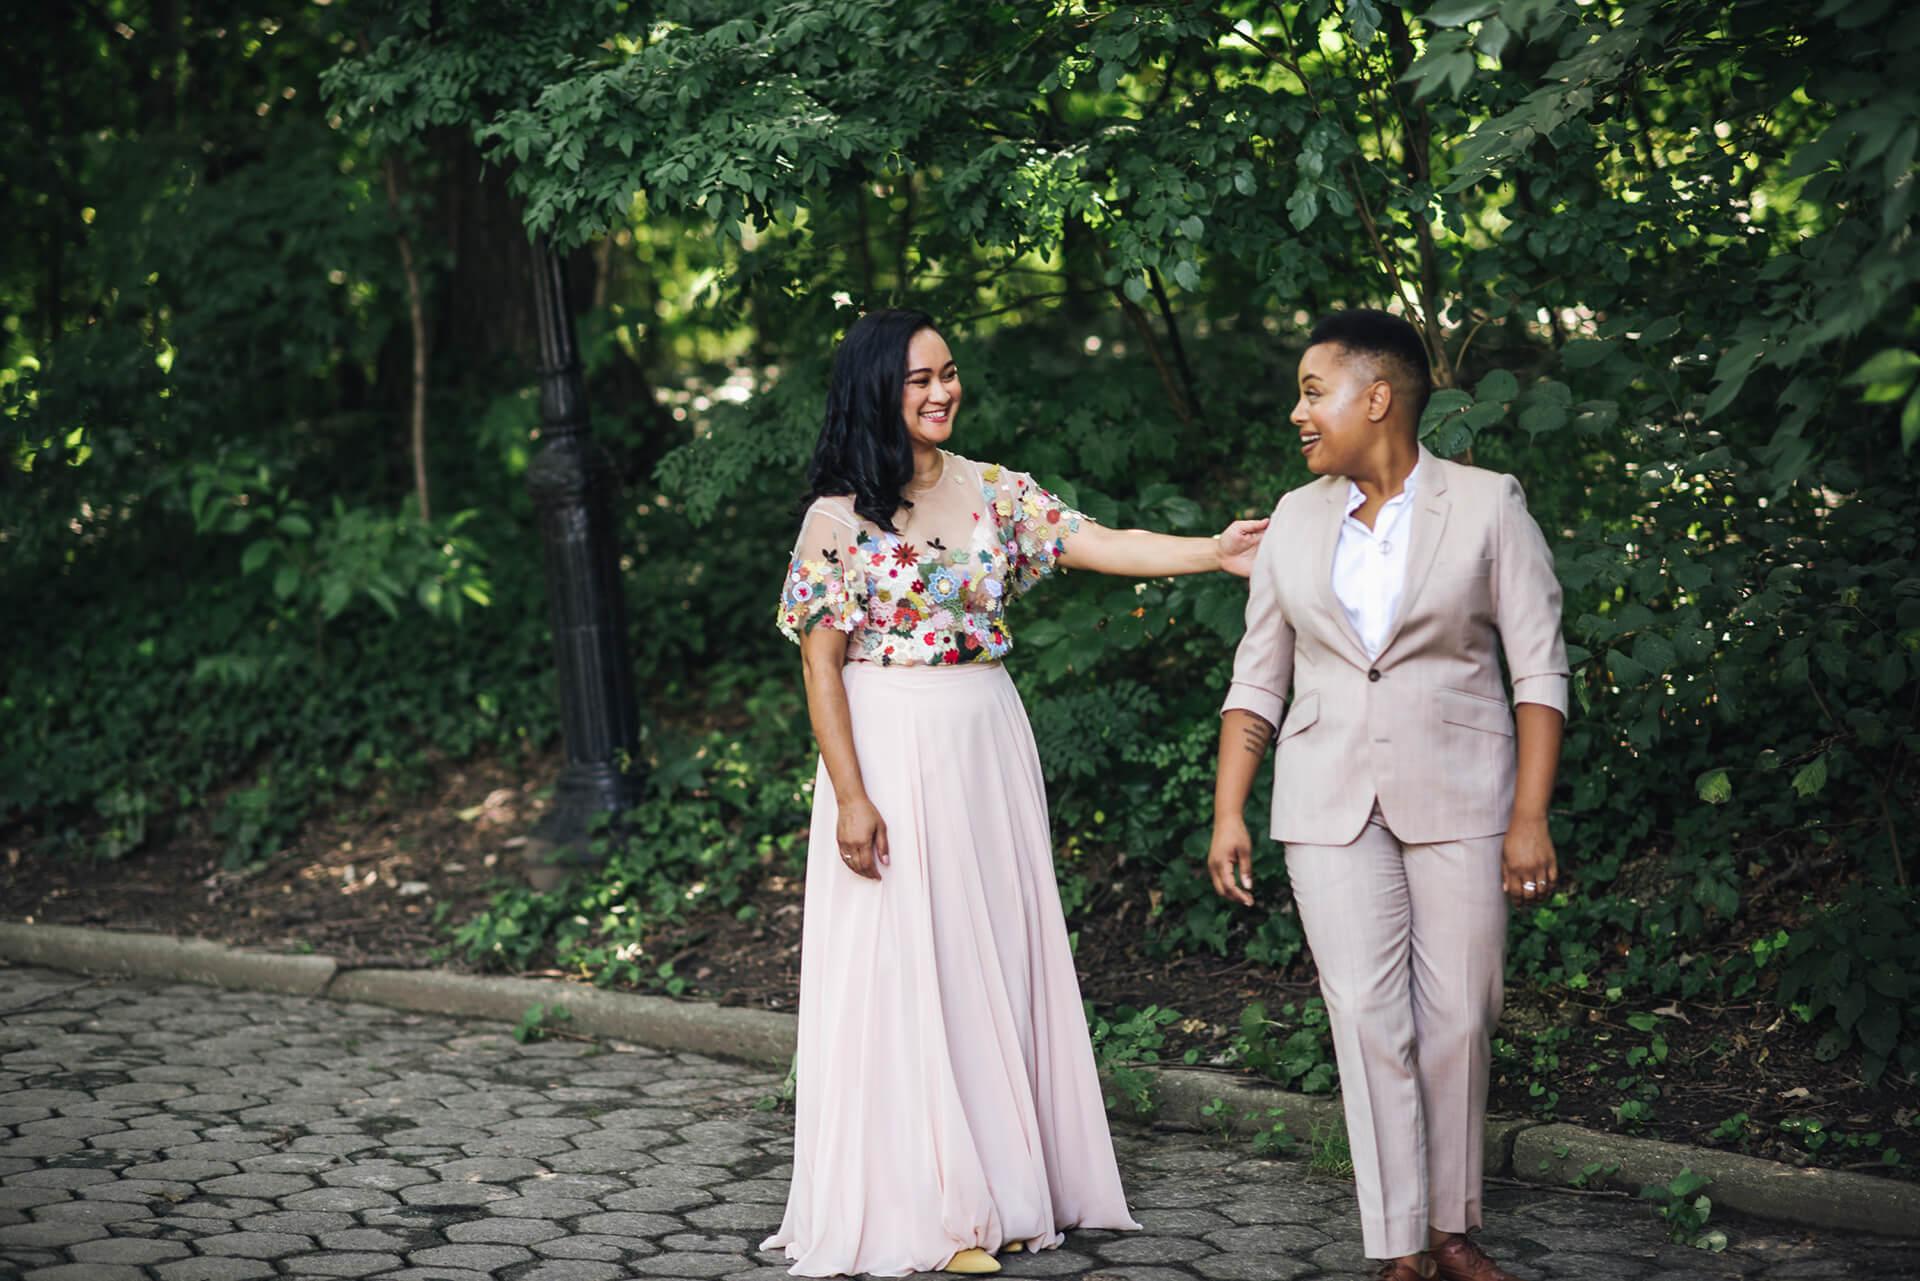 BROOKLYN SOCIETY FOR ETHICAL CULTURE - INTIMATE WEDDING - CHI-CHI ARI-64.jpg